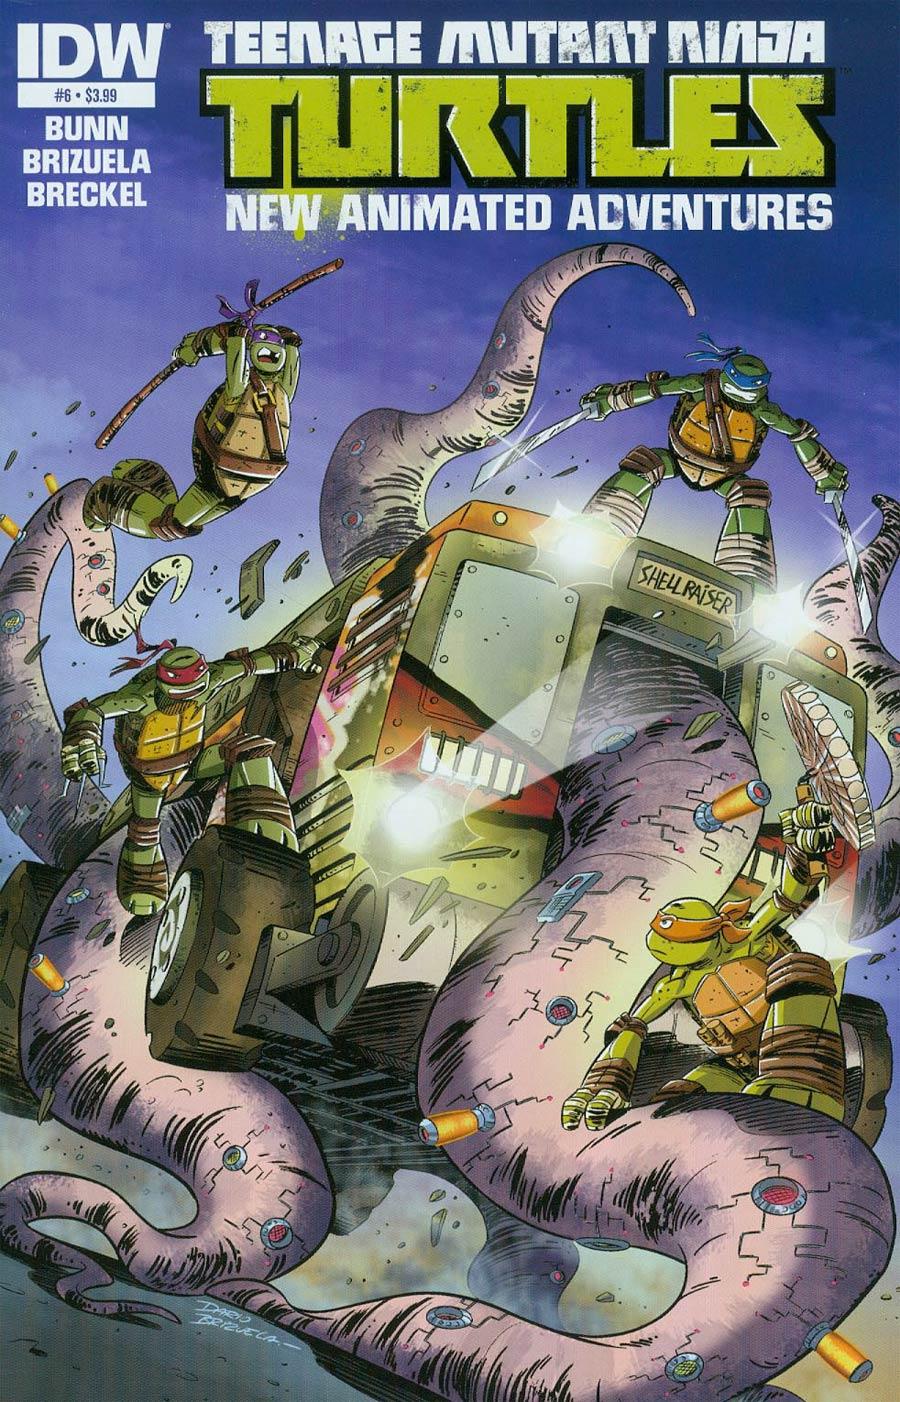 Teenage Mutant Ninja Turtles New Animated Adventures #6 Cover A Regular Dario Brizuela Cover